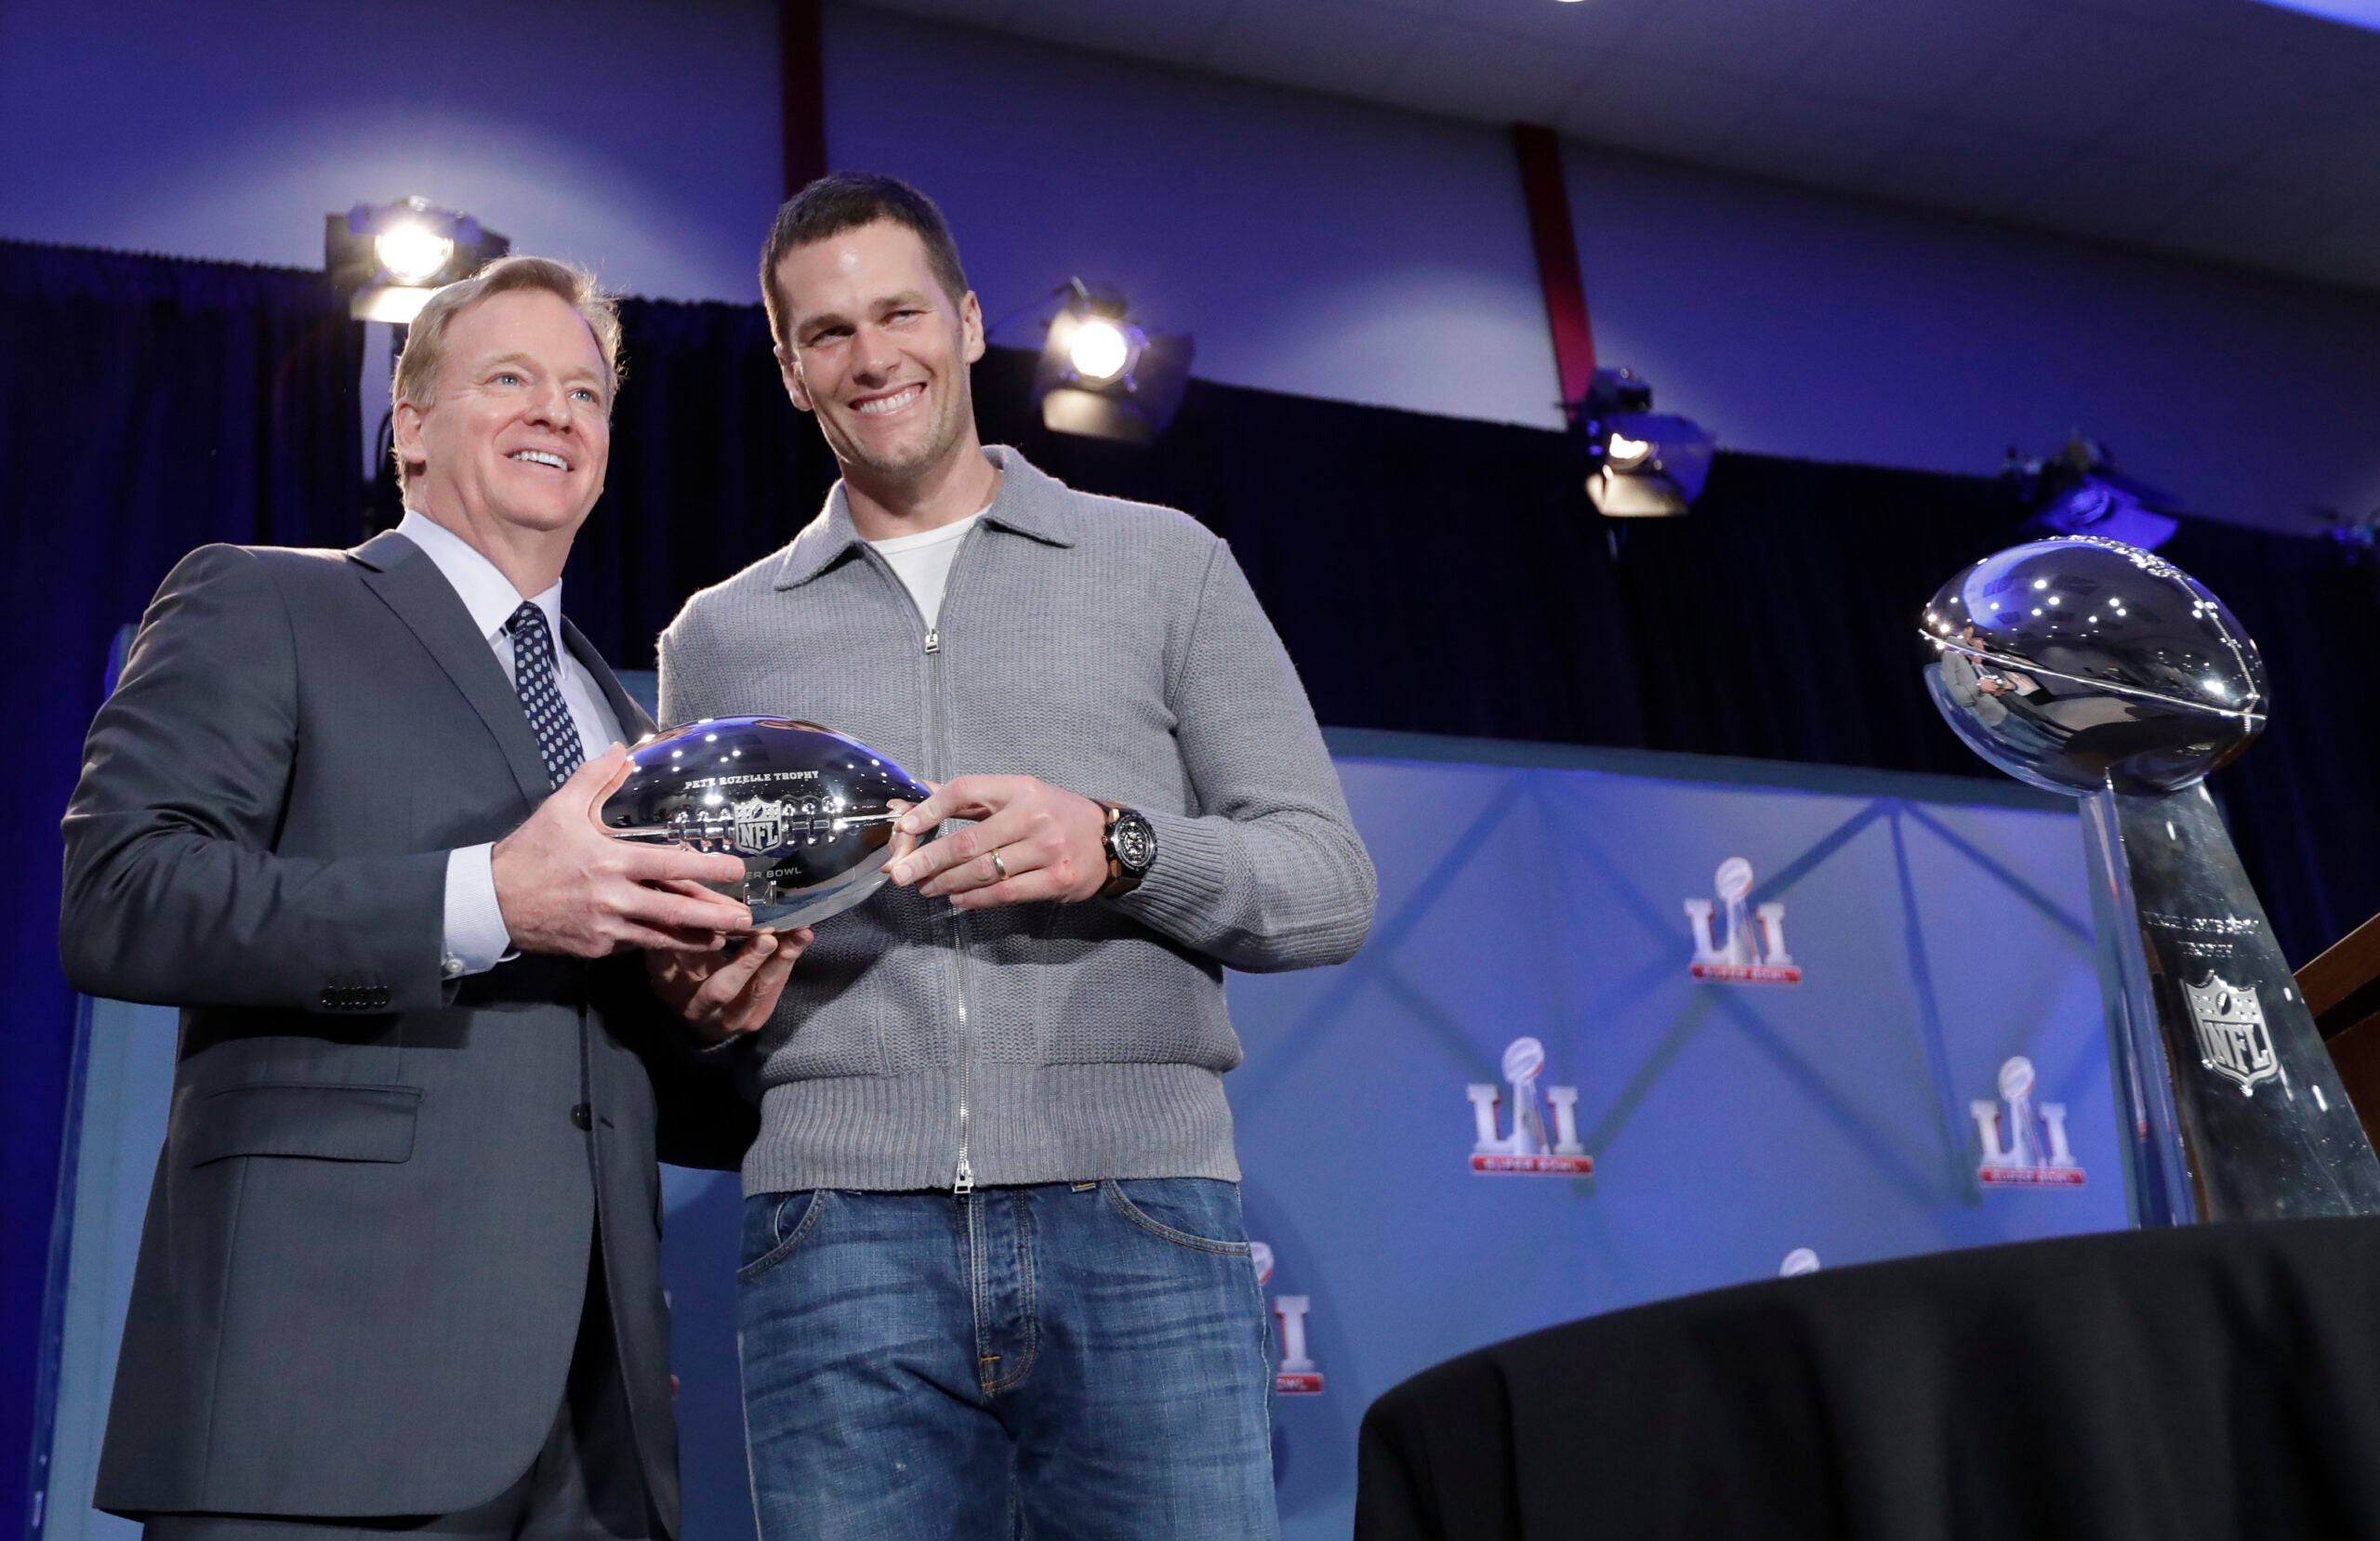 Brady and Goodell